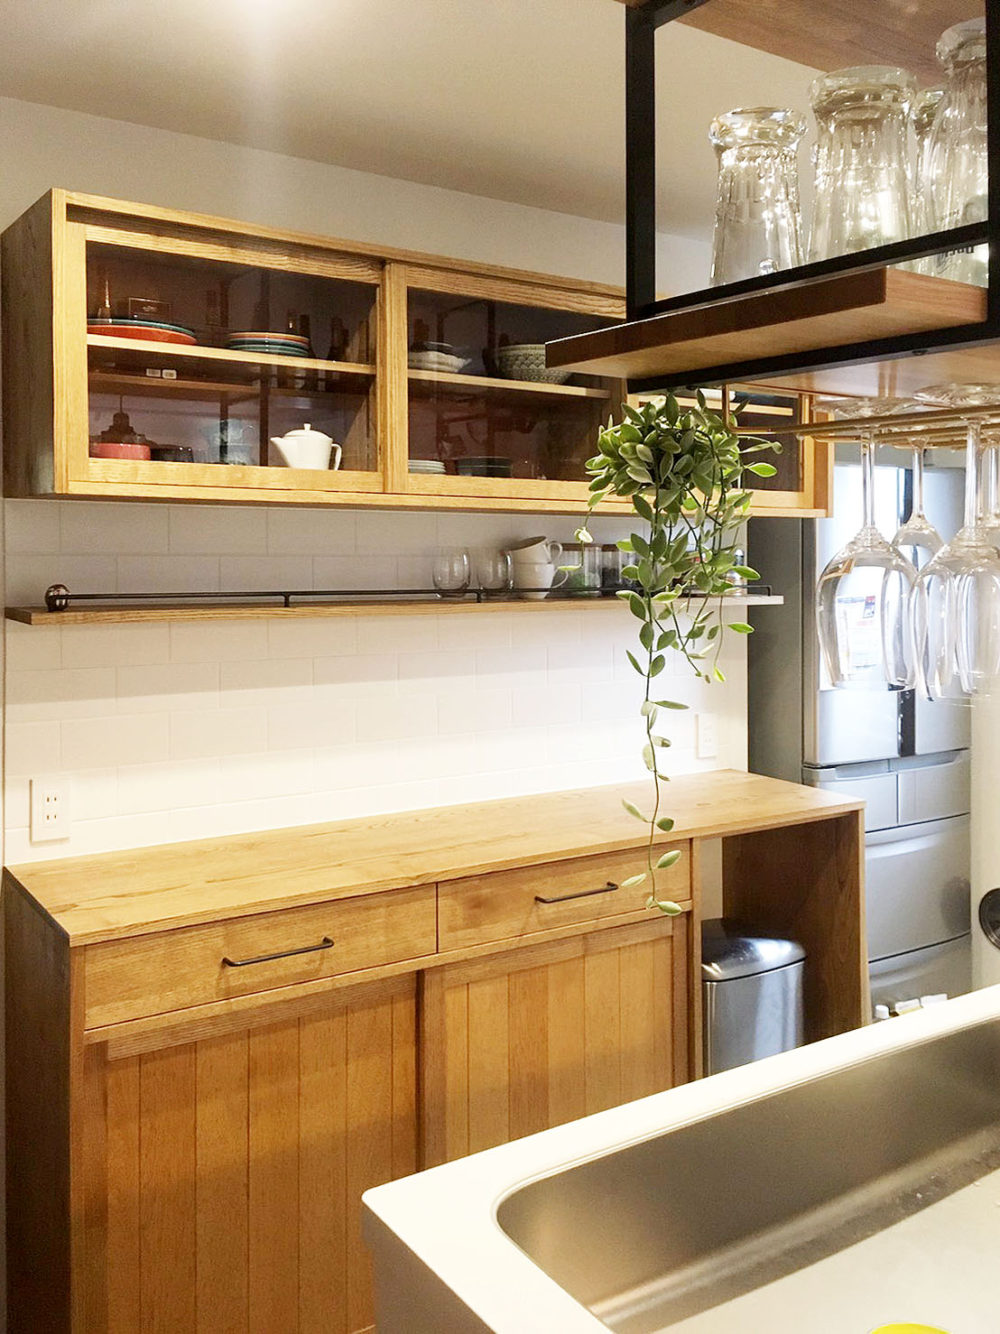 オーダー家具・食器棚/関東・東京・町田